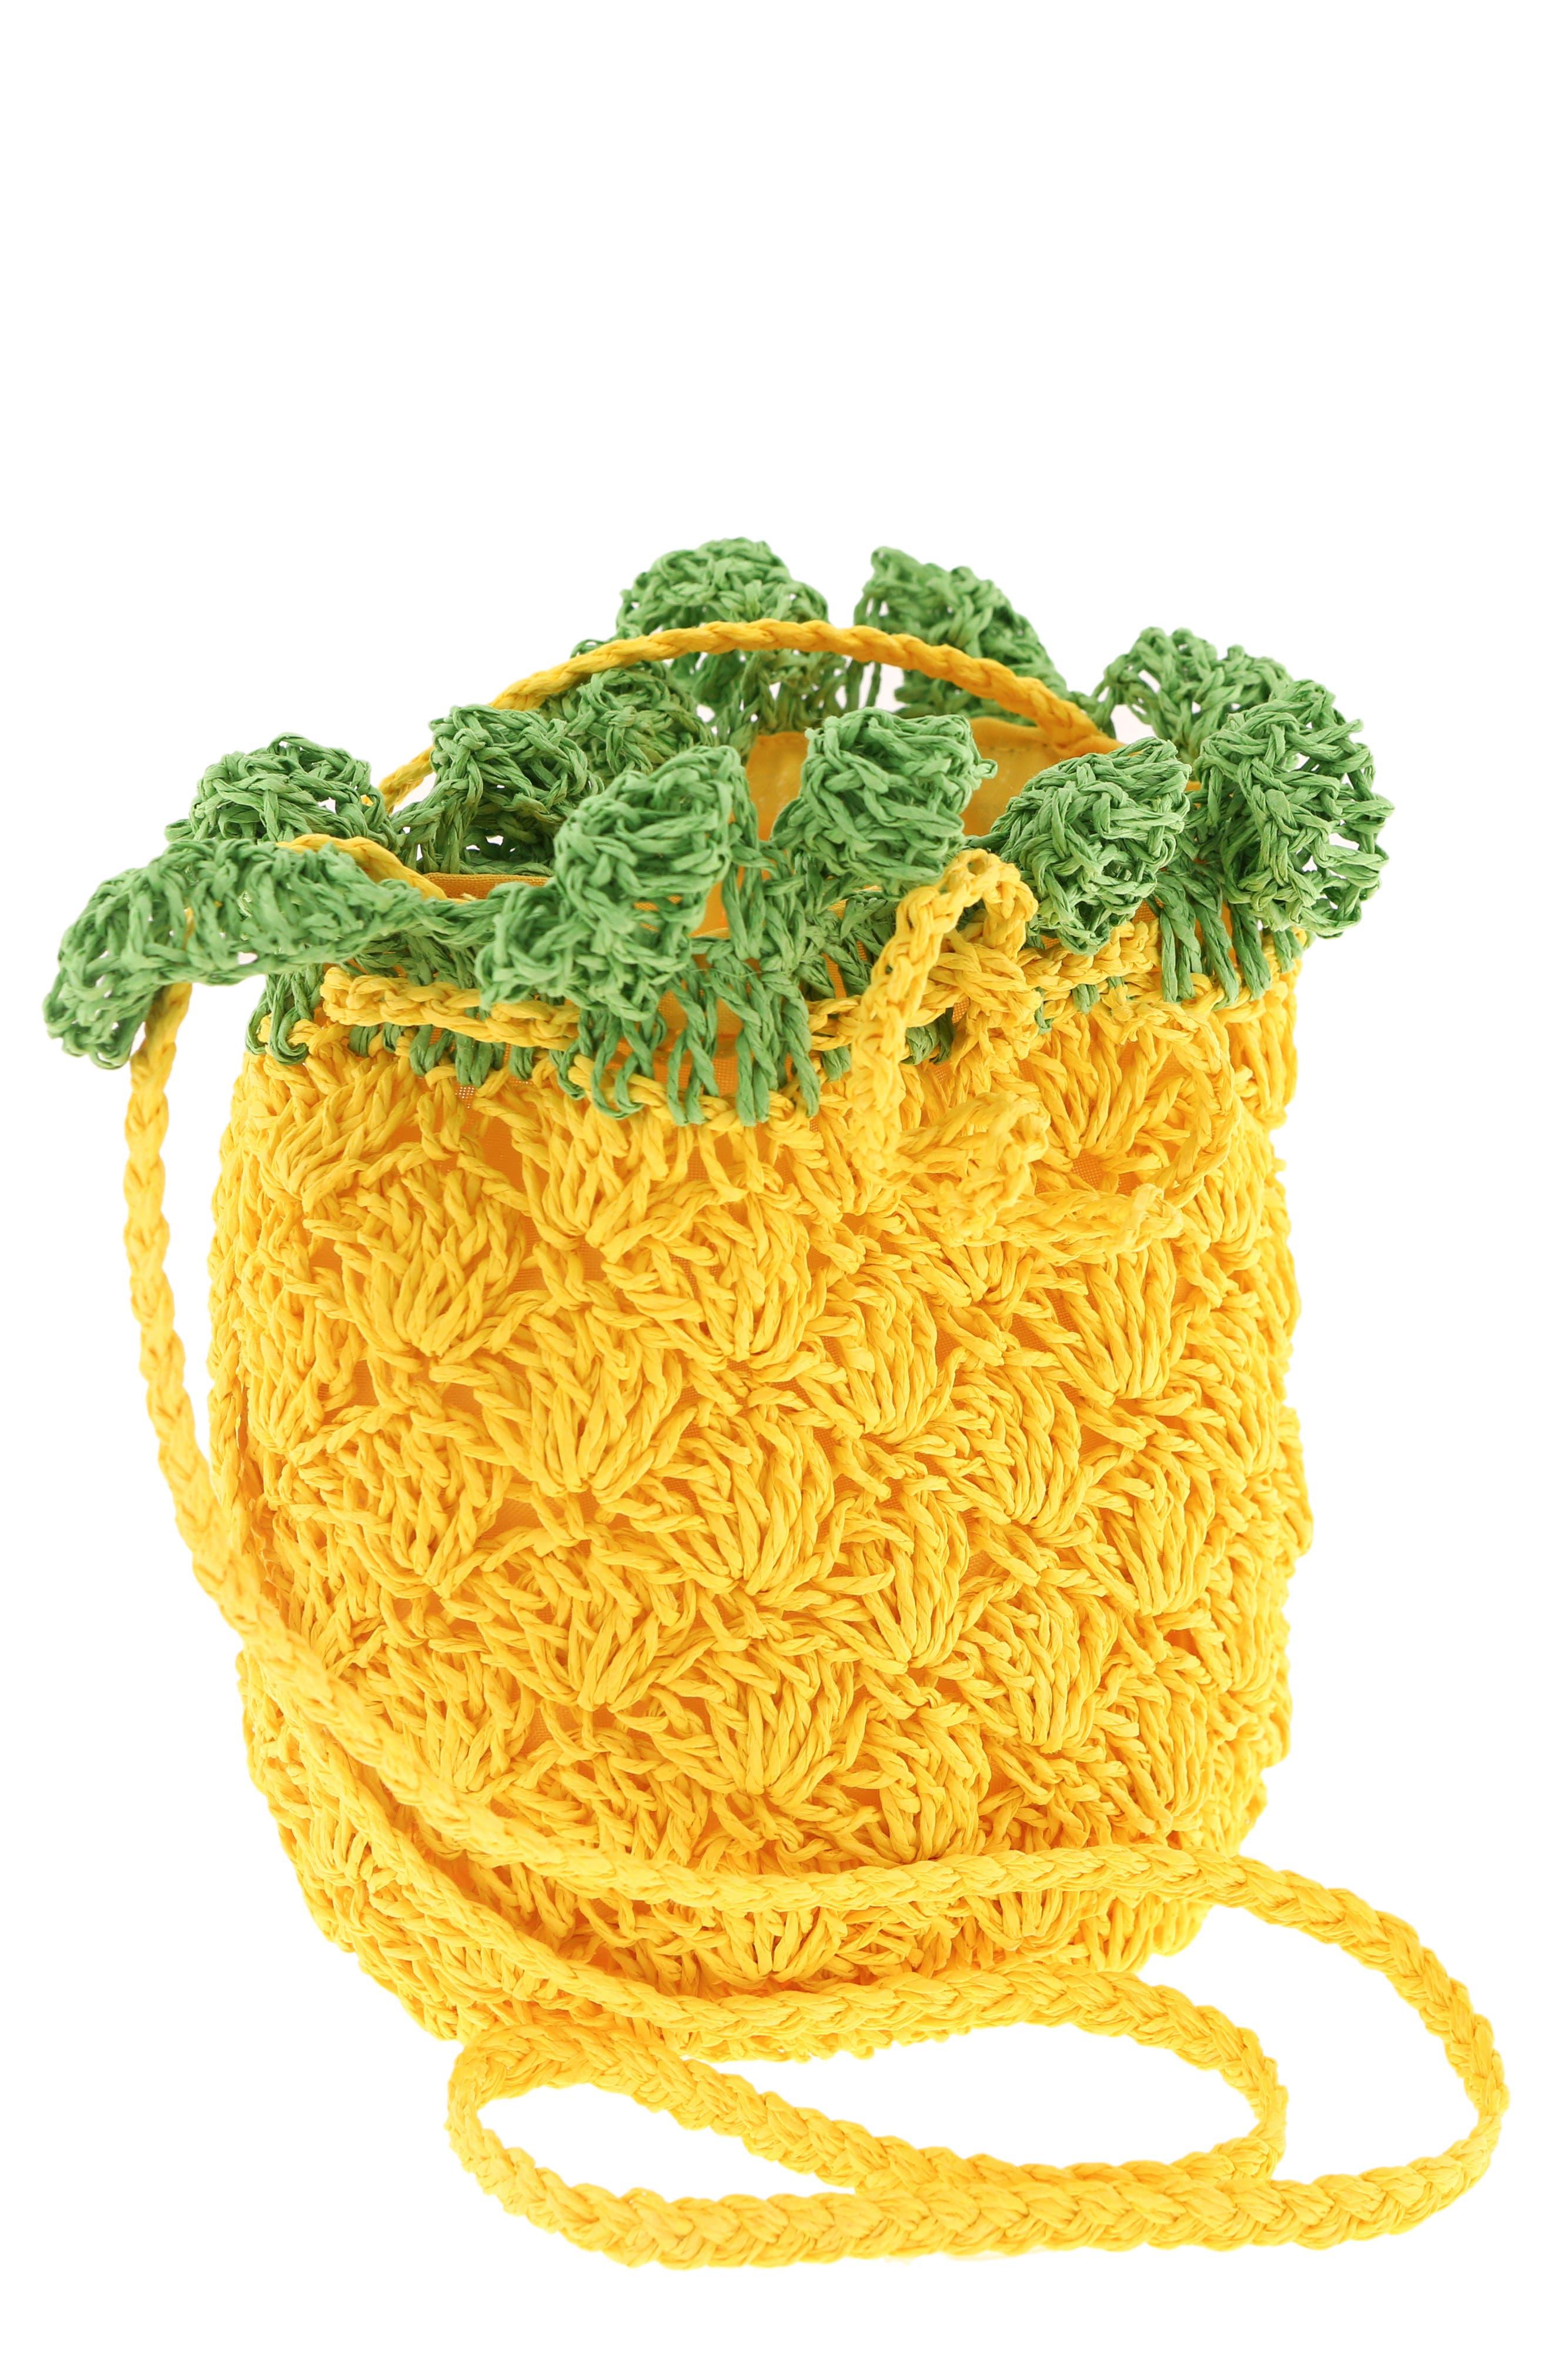 CAPELLI NEW YORK Crochet Pineapple Crossbody Bag, Main, color, YELLOW COMBO